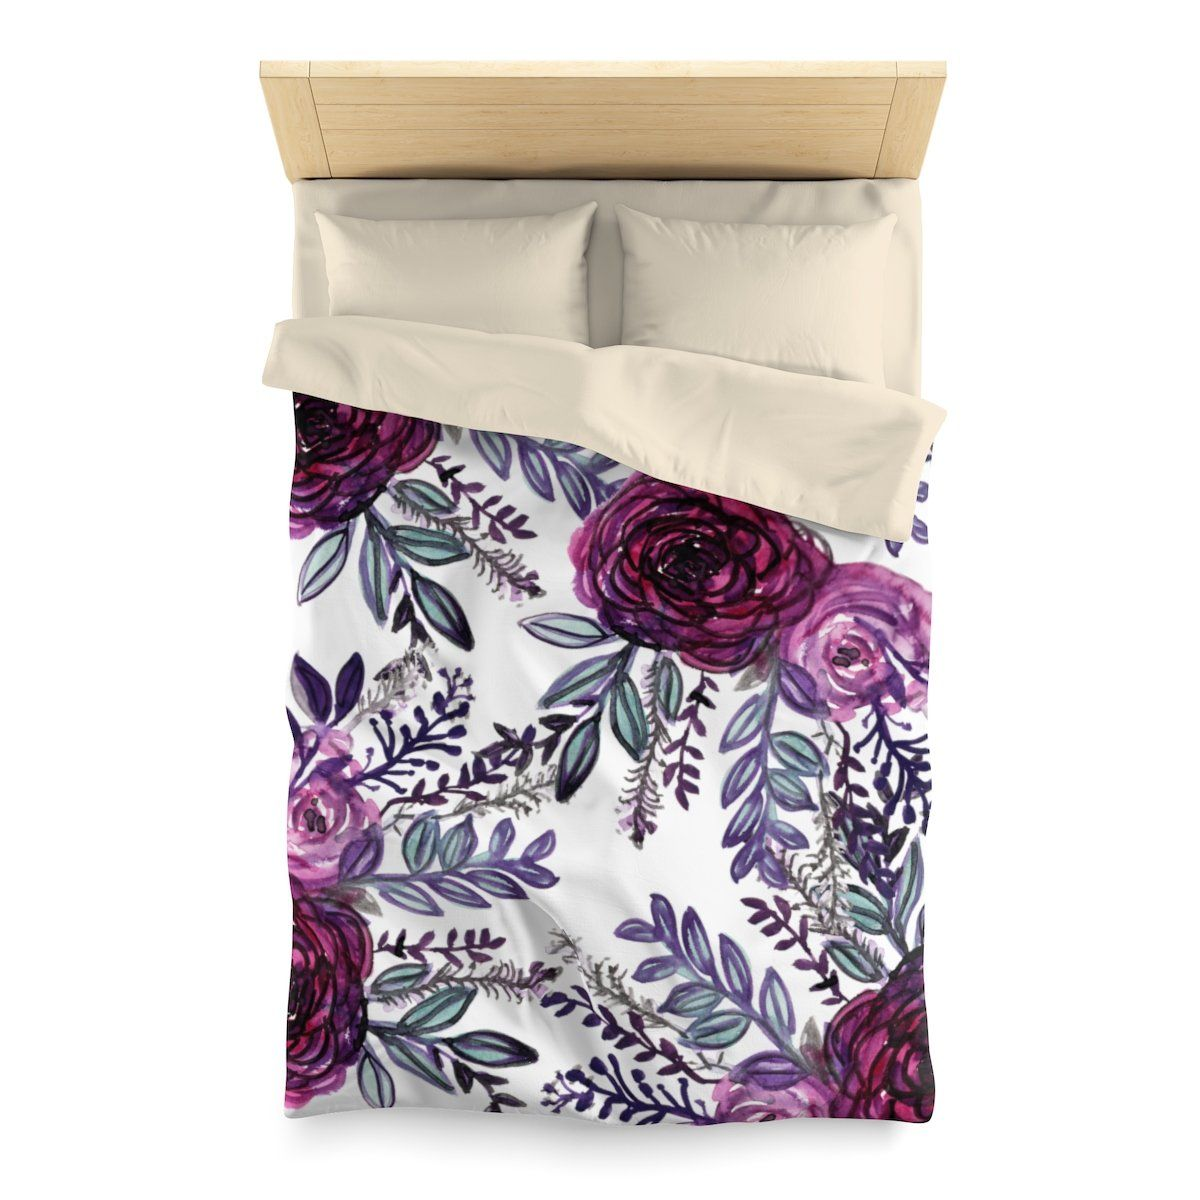 Purple Pink Floral Rose Comfy 100 Polyester Microfiber